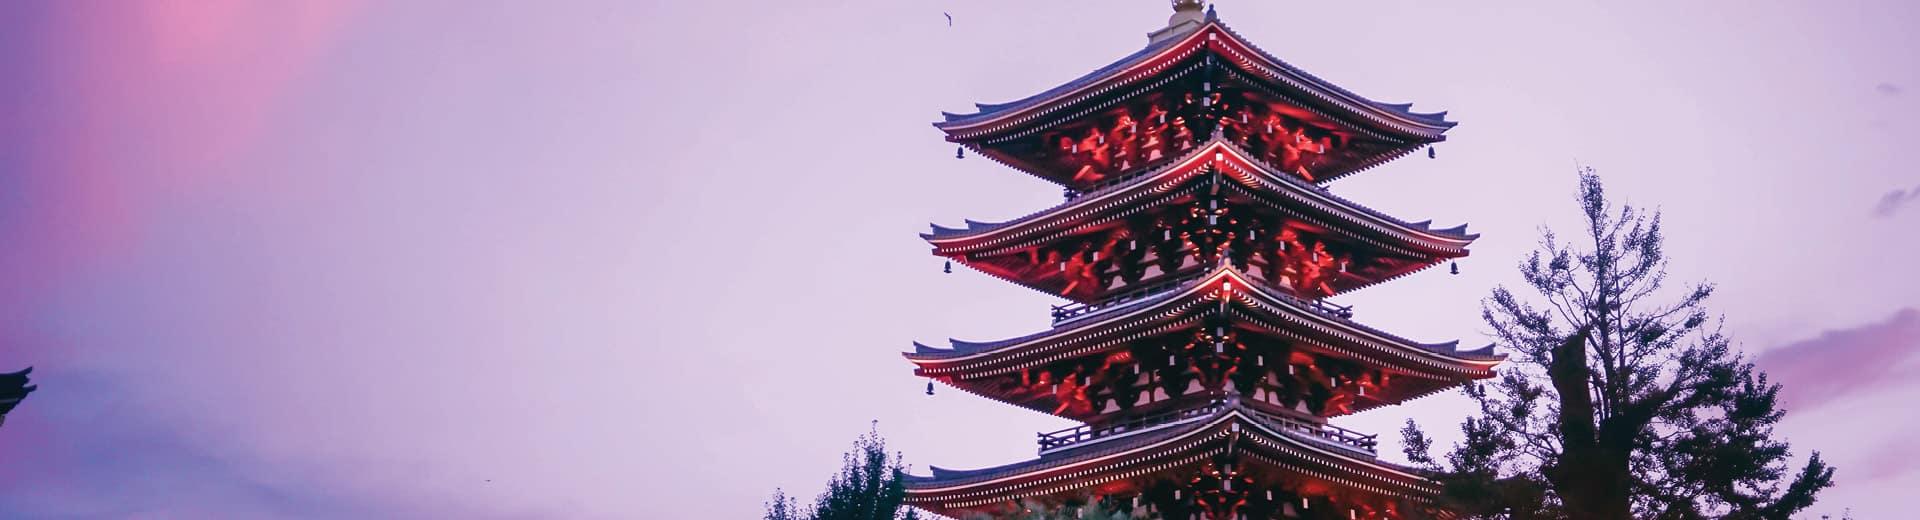 tokyo architecture pagoda